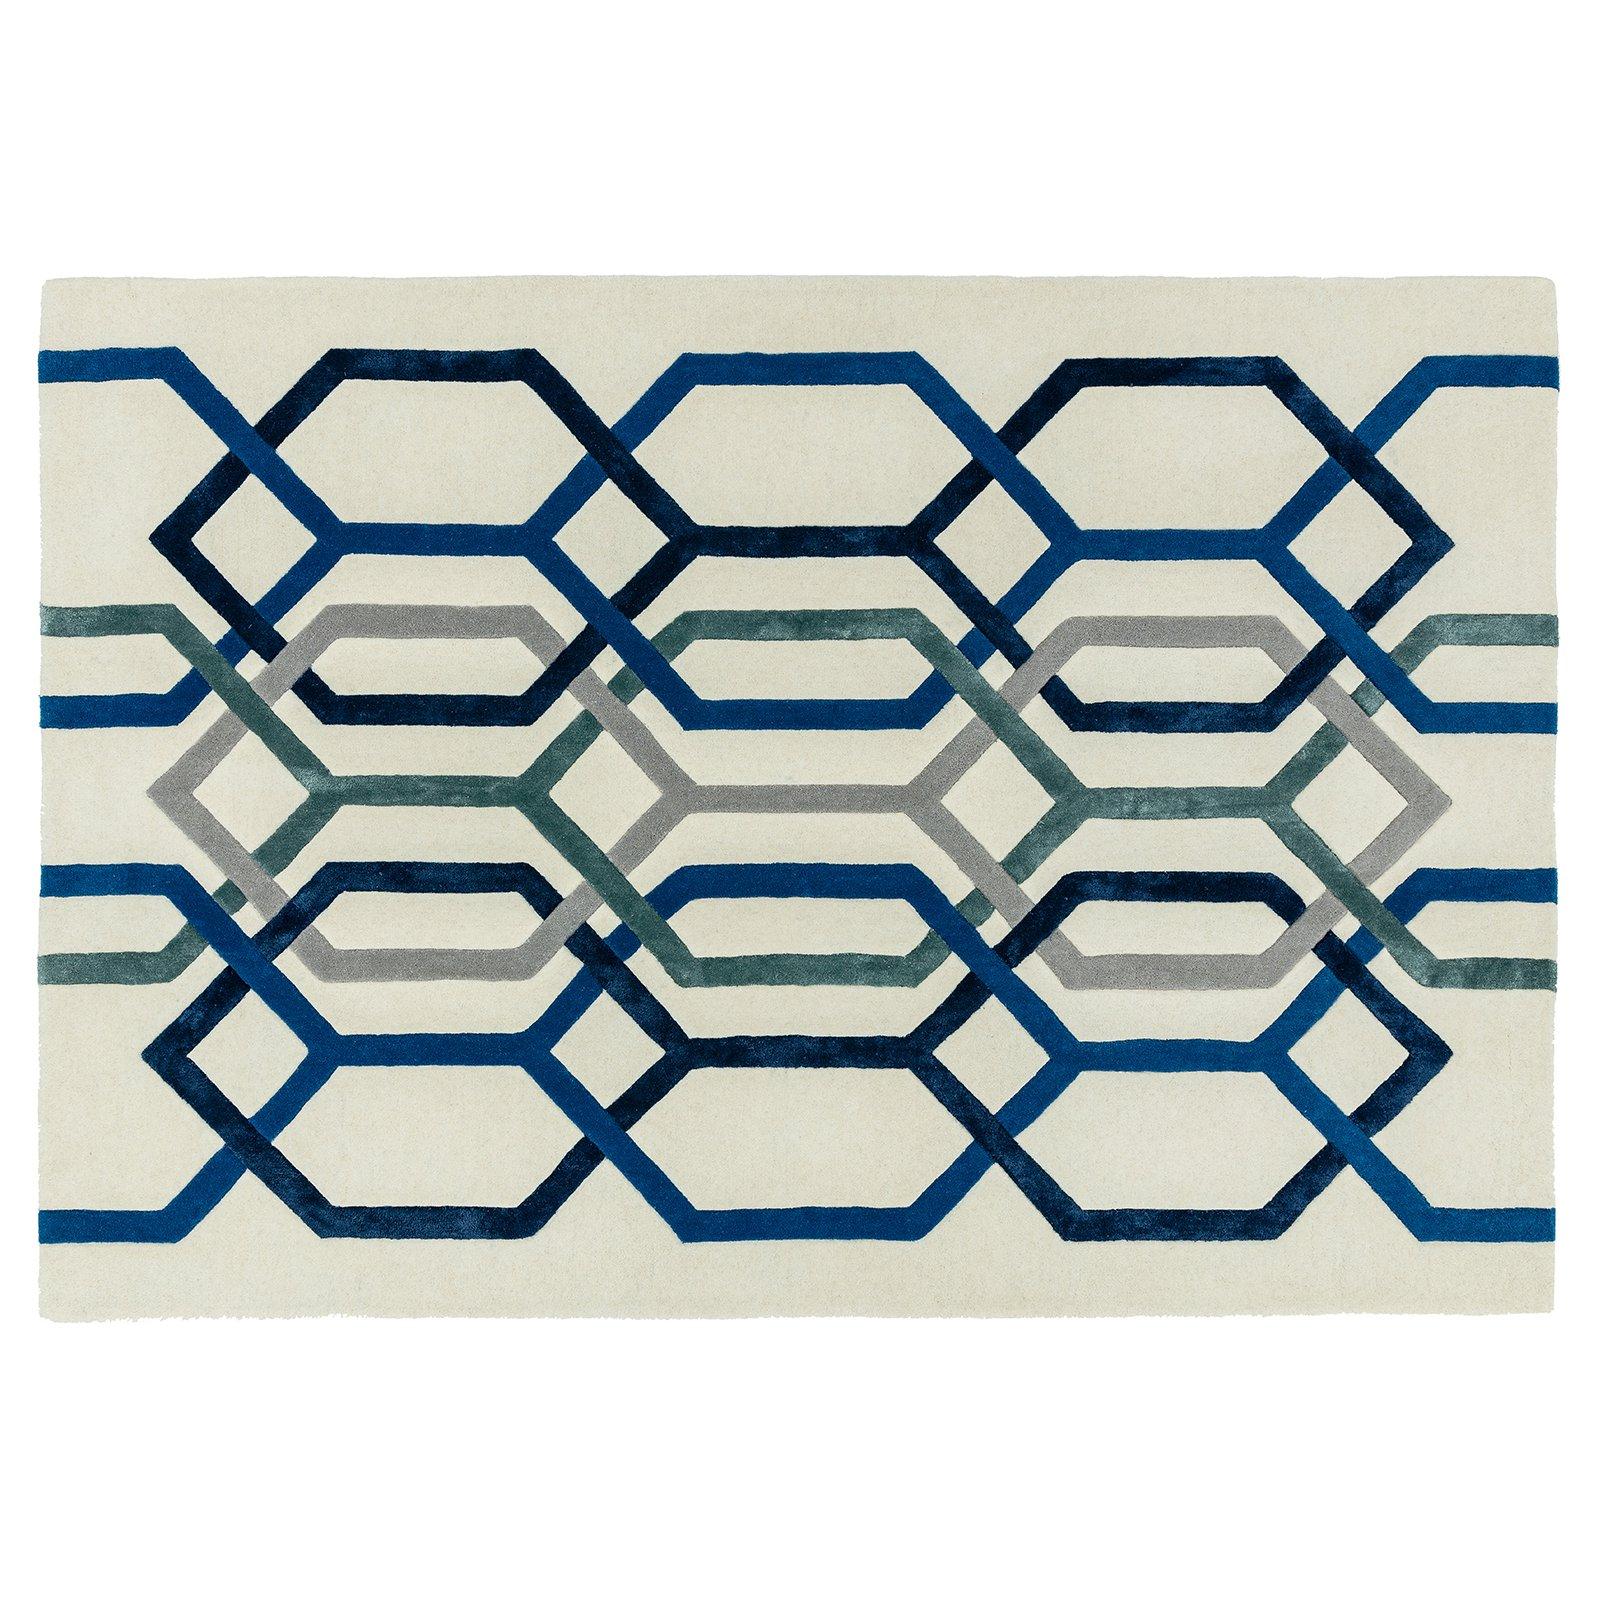 image-Geom Wool Rug, 120X170 cm, White